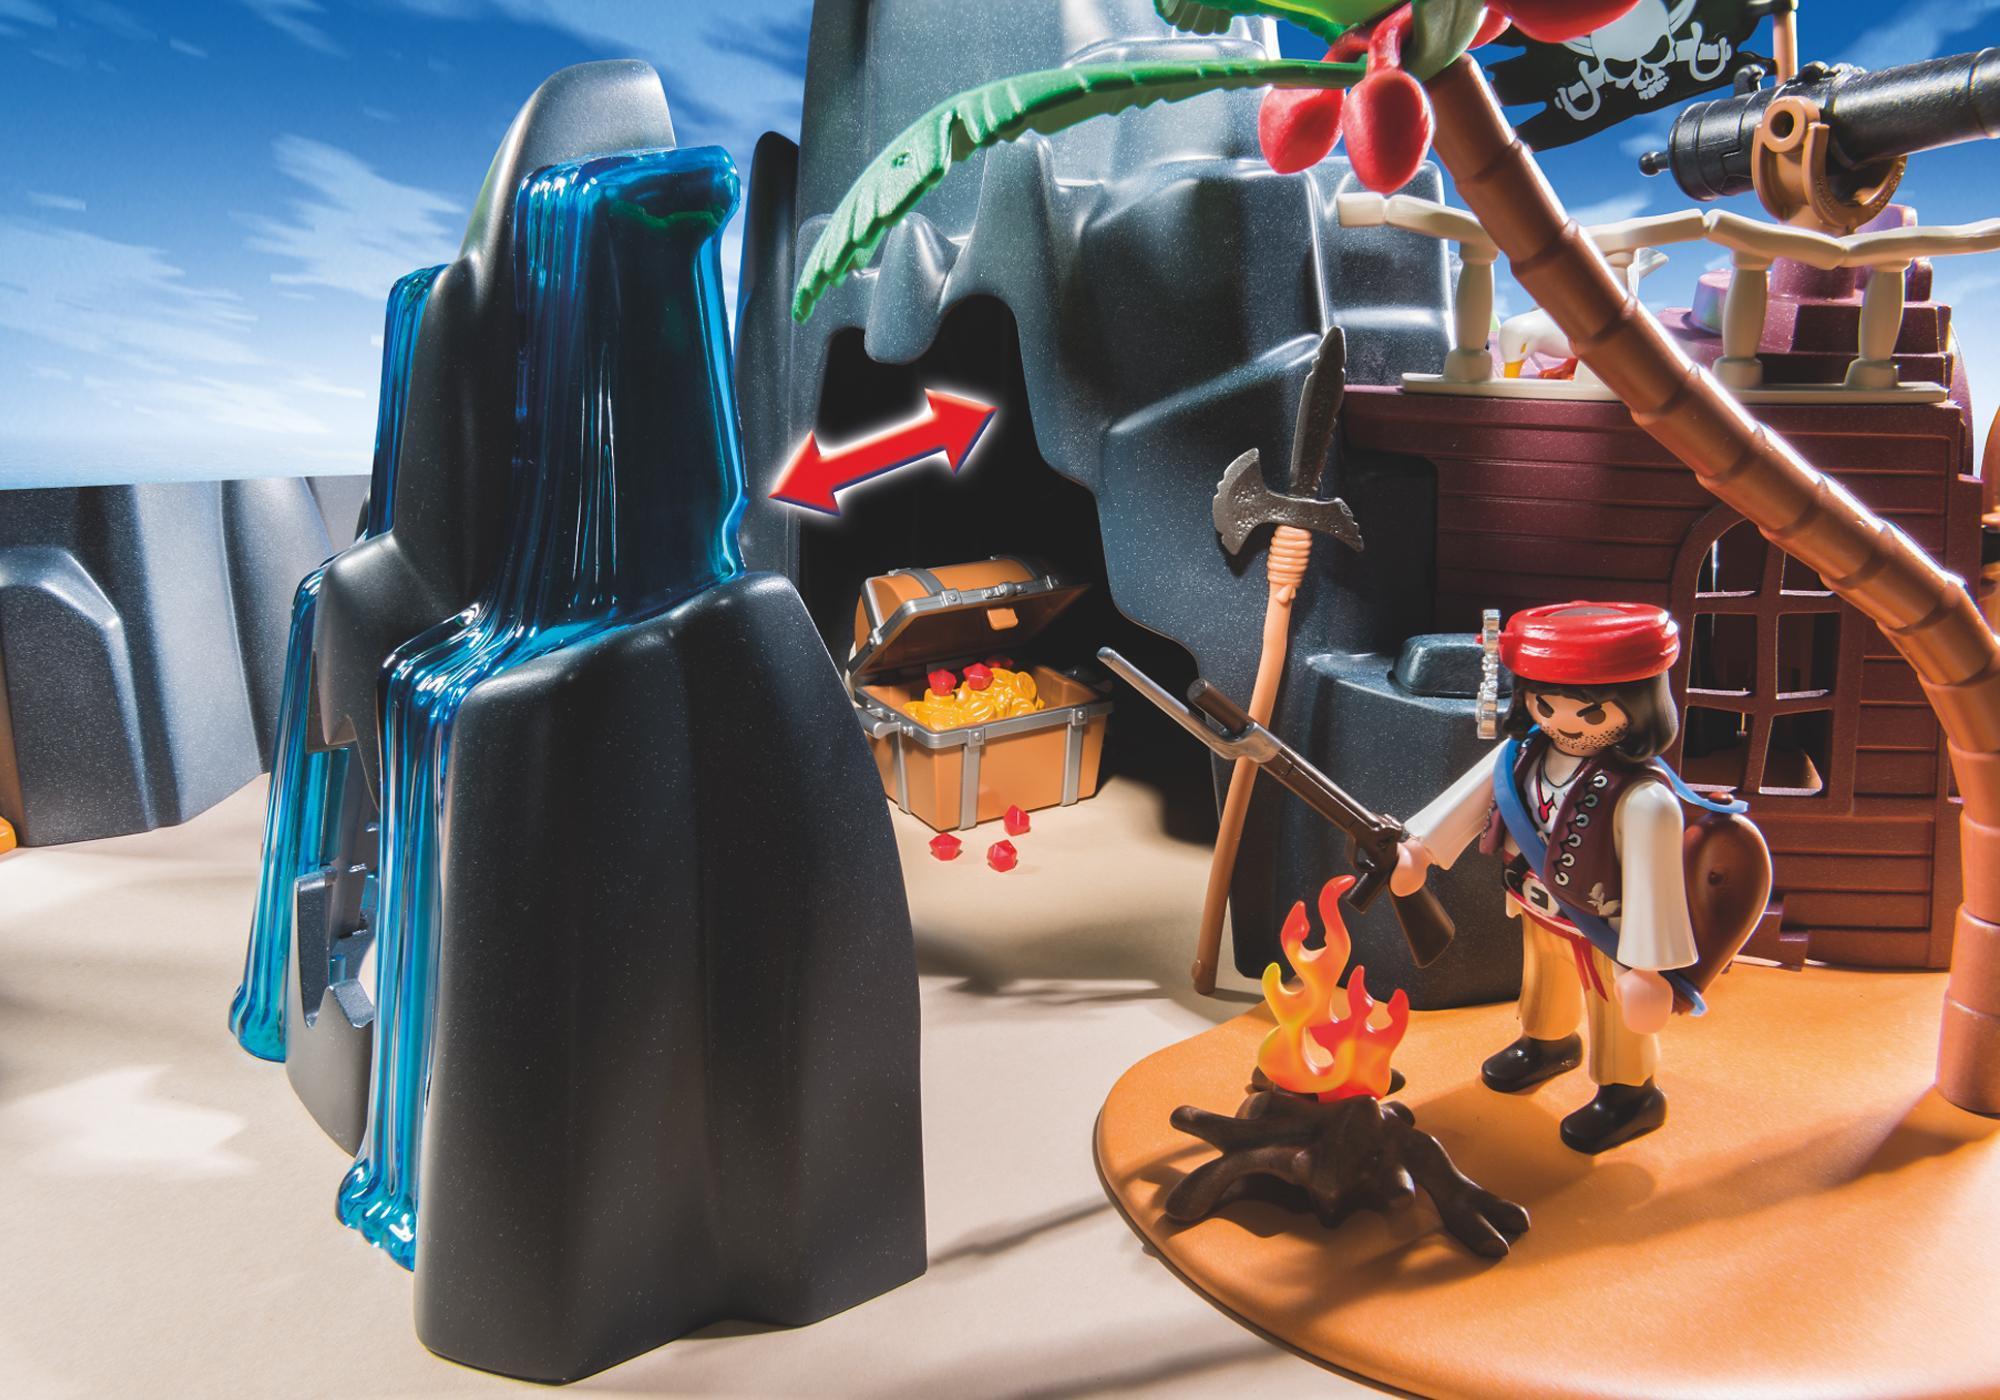 http://media.playmobil.com/i/playmobil/6679_product_extra1